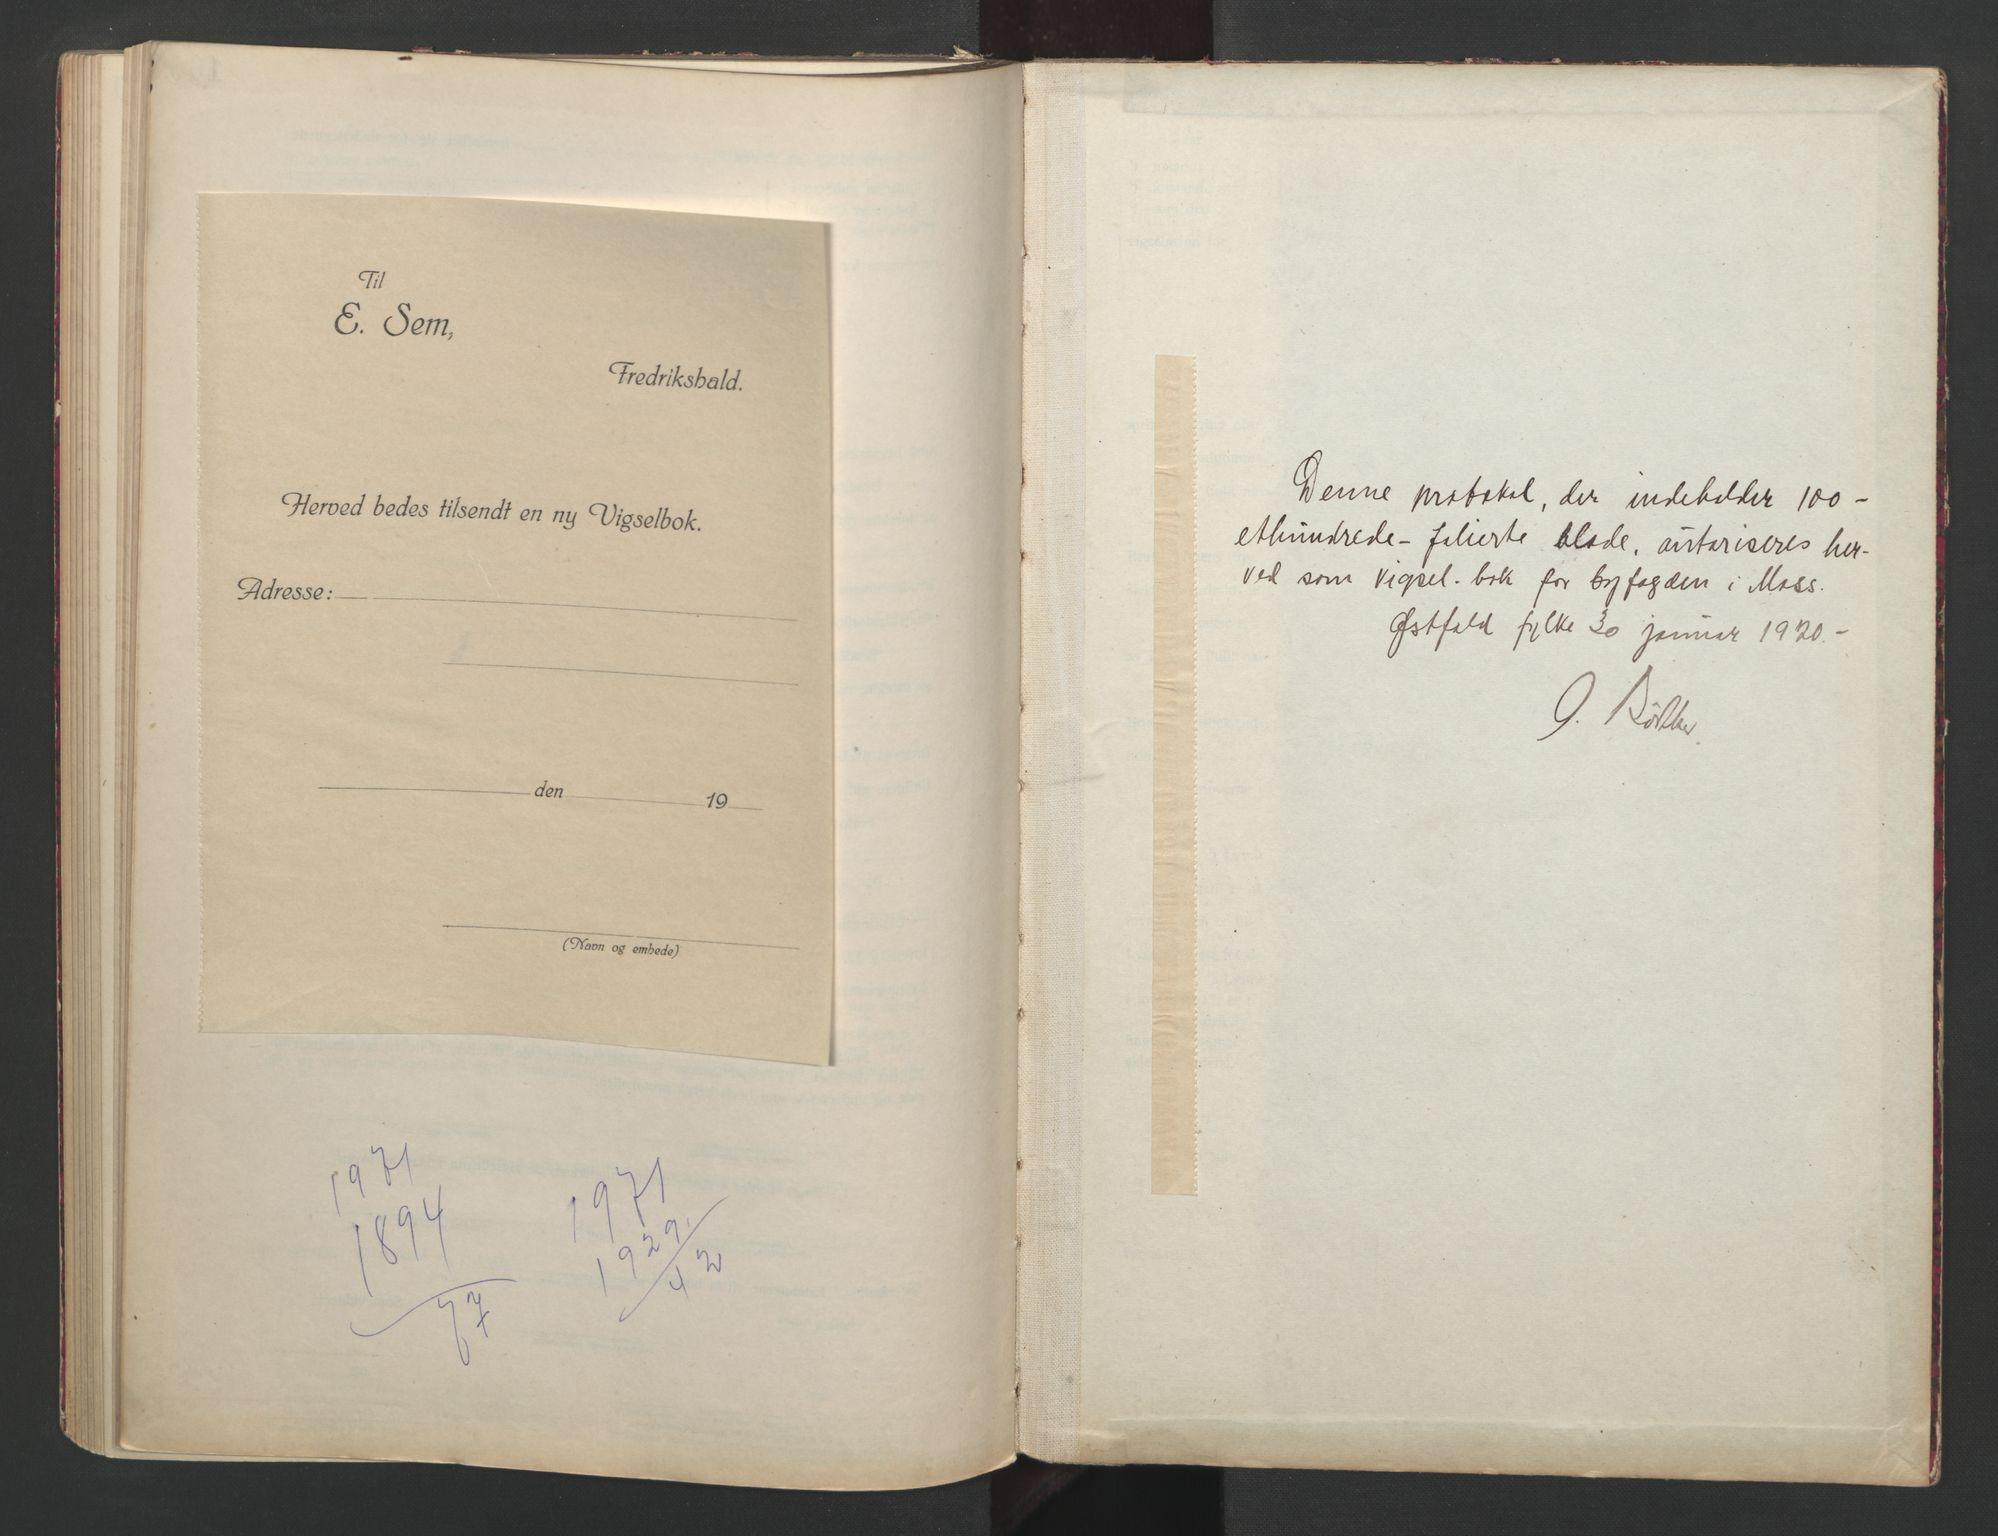 SAO, Moss byfogd, L/Lb/L0003: Vigselsbok, 1920-1932, s. upaginert